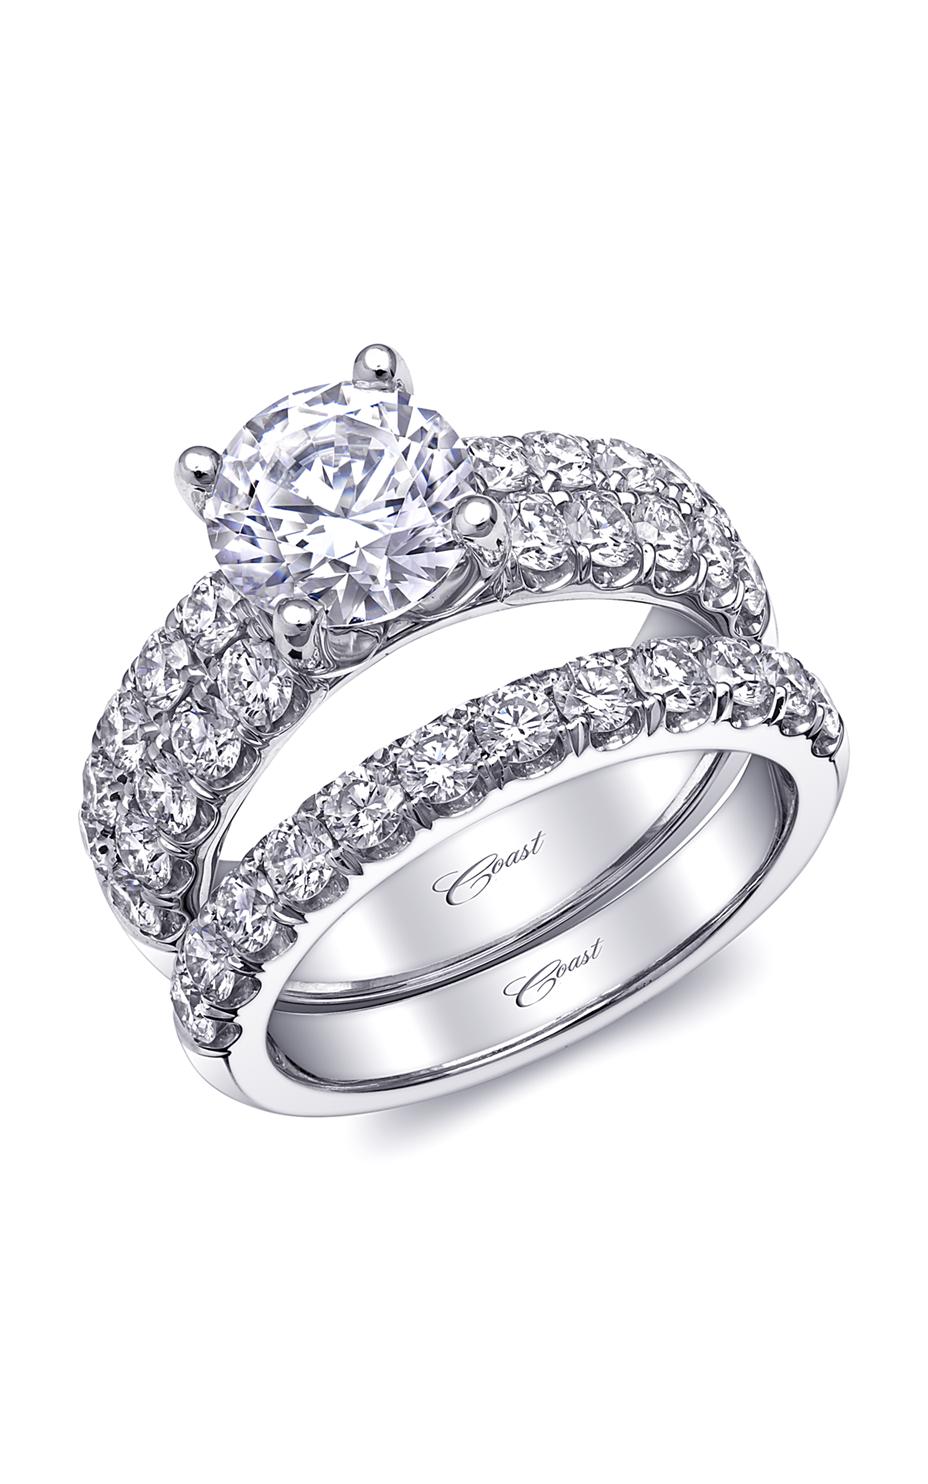 Coast Diamond Charisma LJ6024 WJ6024 product image